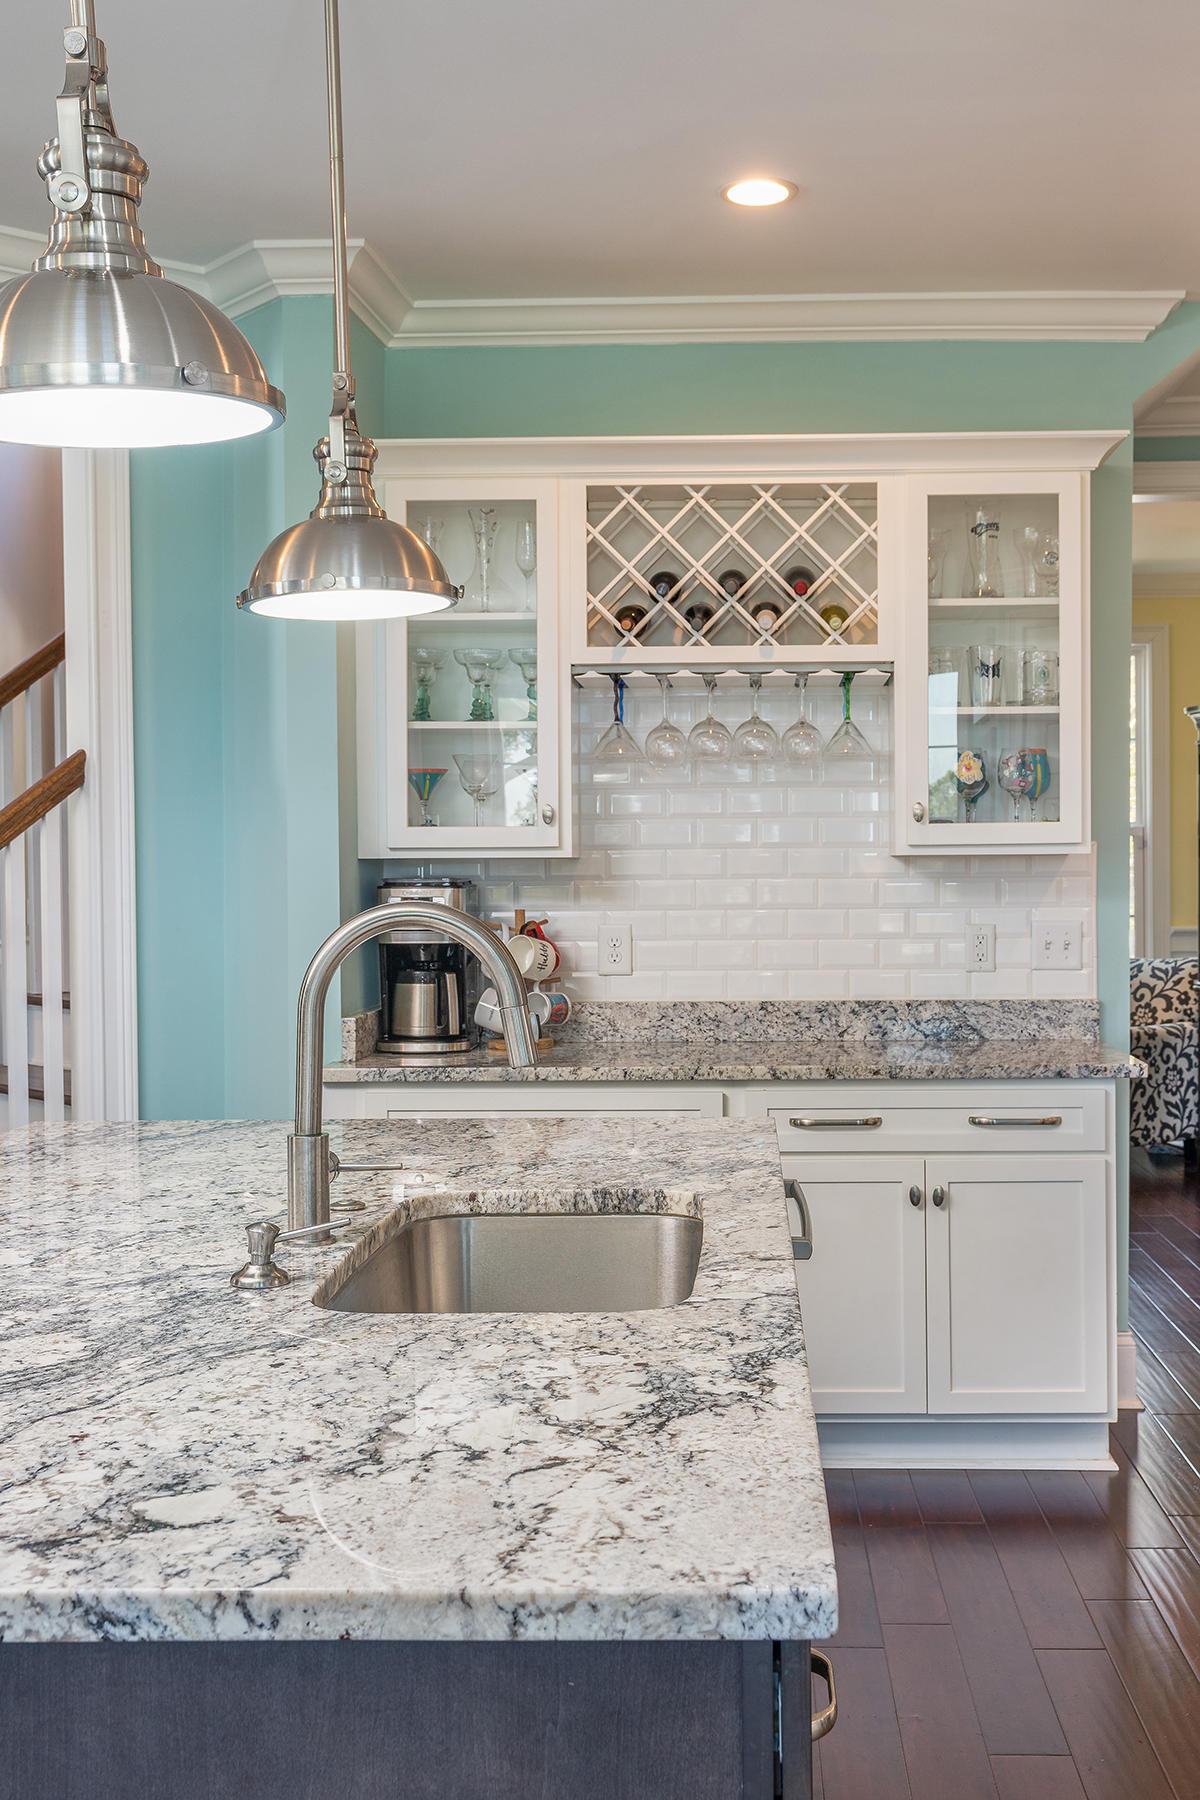 Scotts Creek Homes For Sale - 1389 Scotts Creek, Mount Pleasant, SC - 37